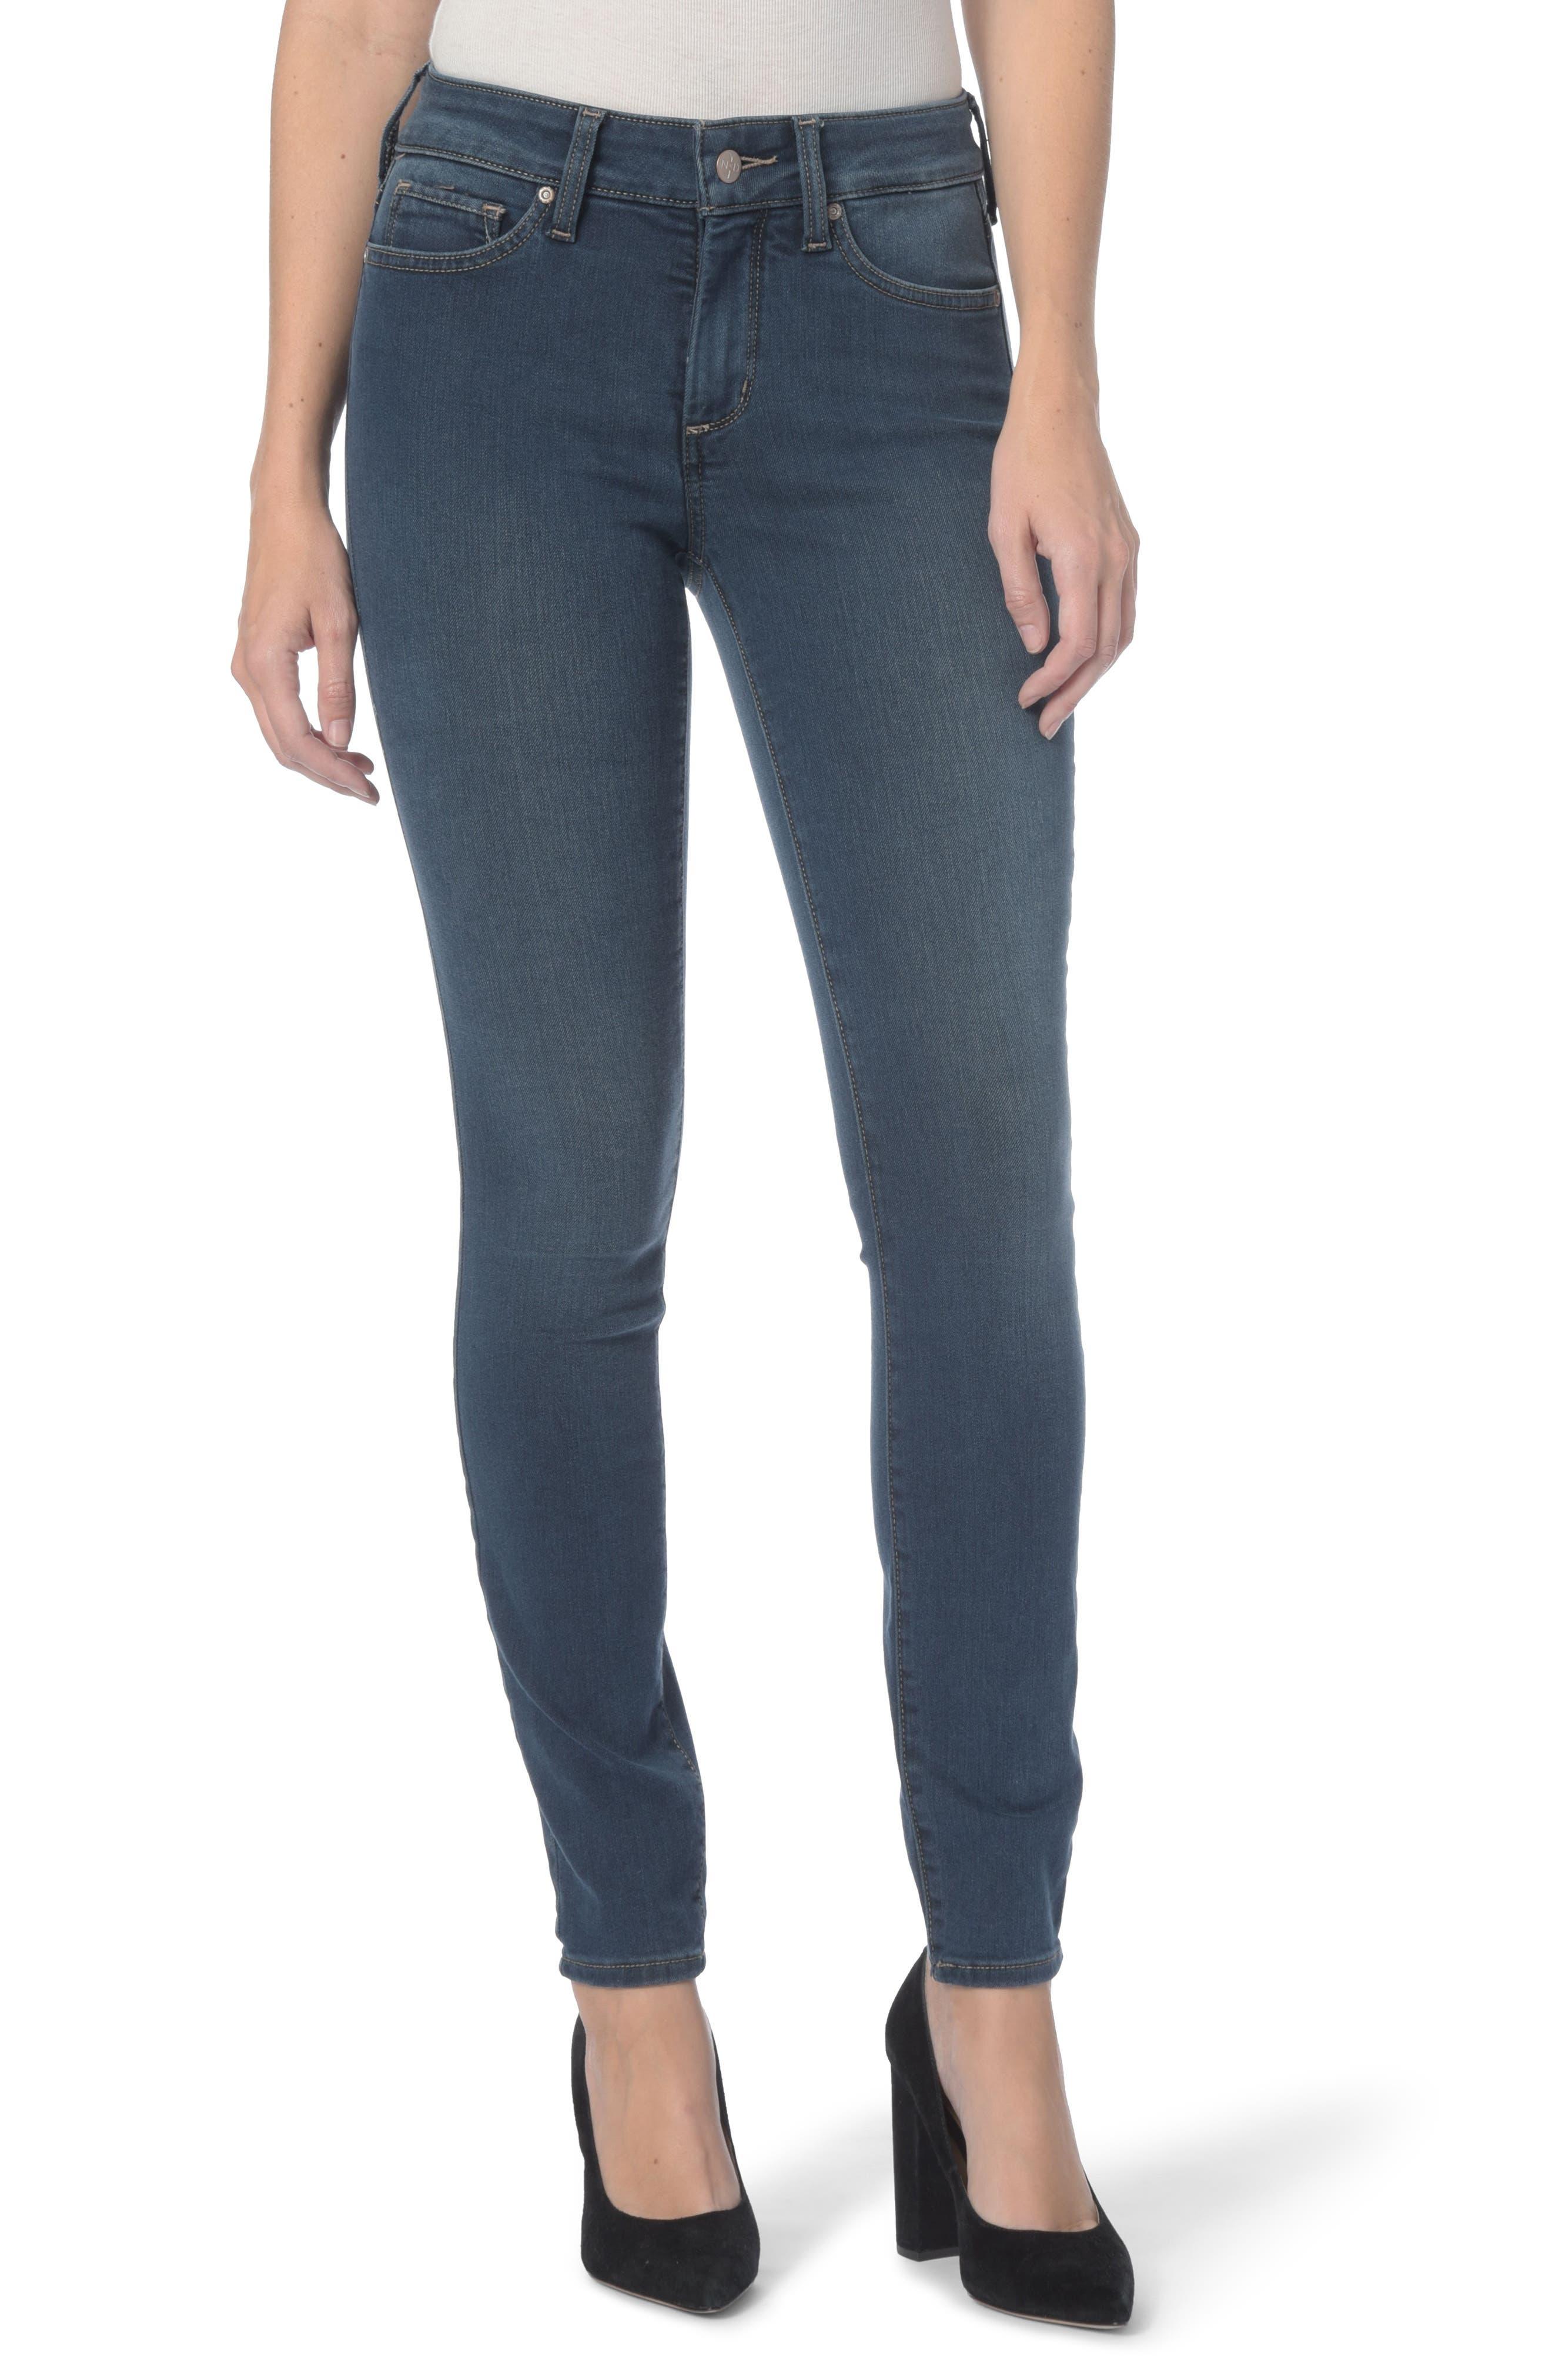 NYDJ Ami Stretch Super Skinny Jeans (Rome) (Regular & Petite)